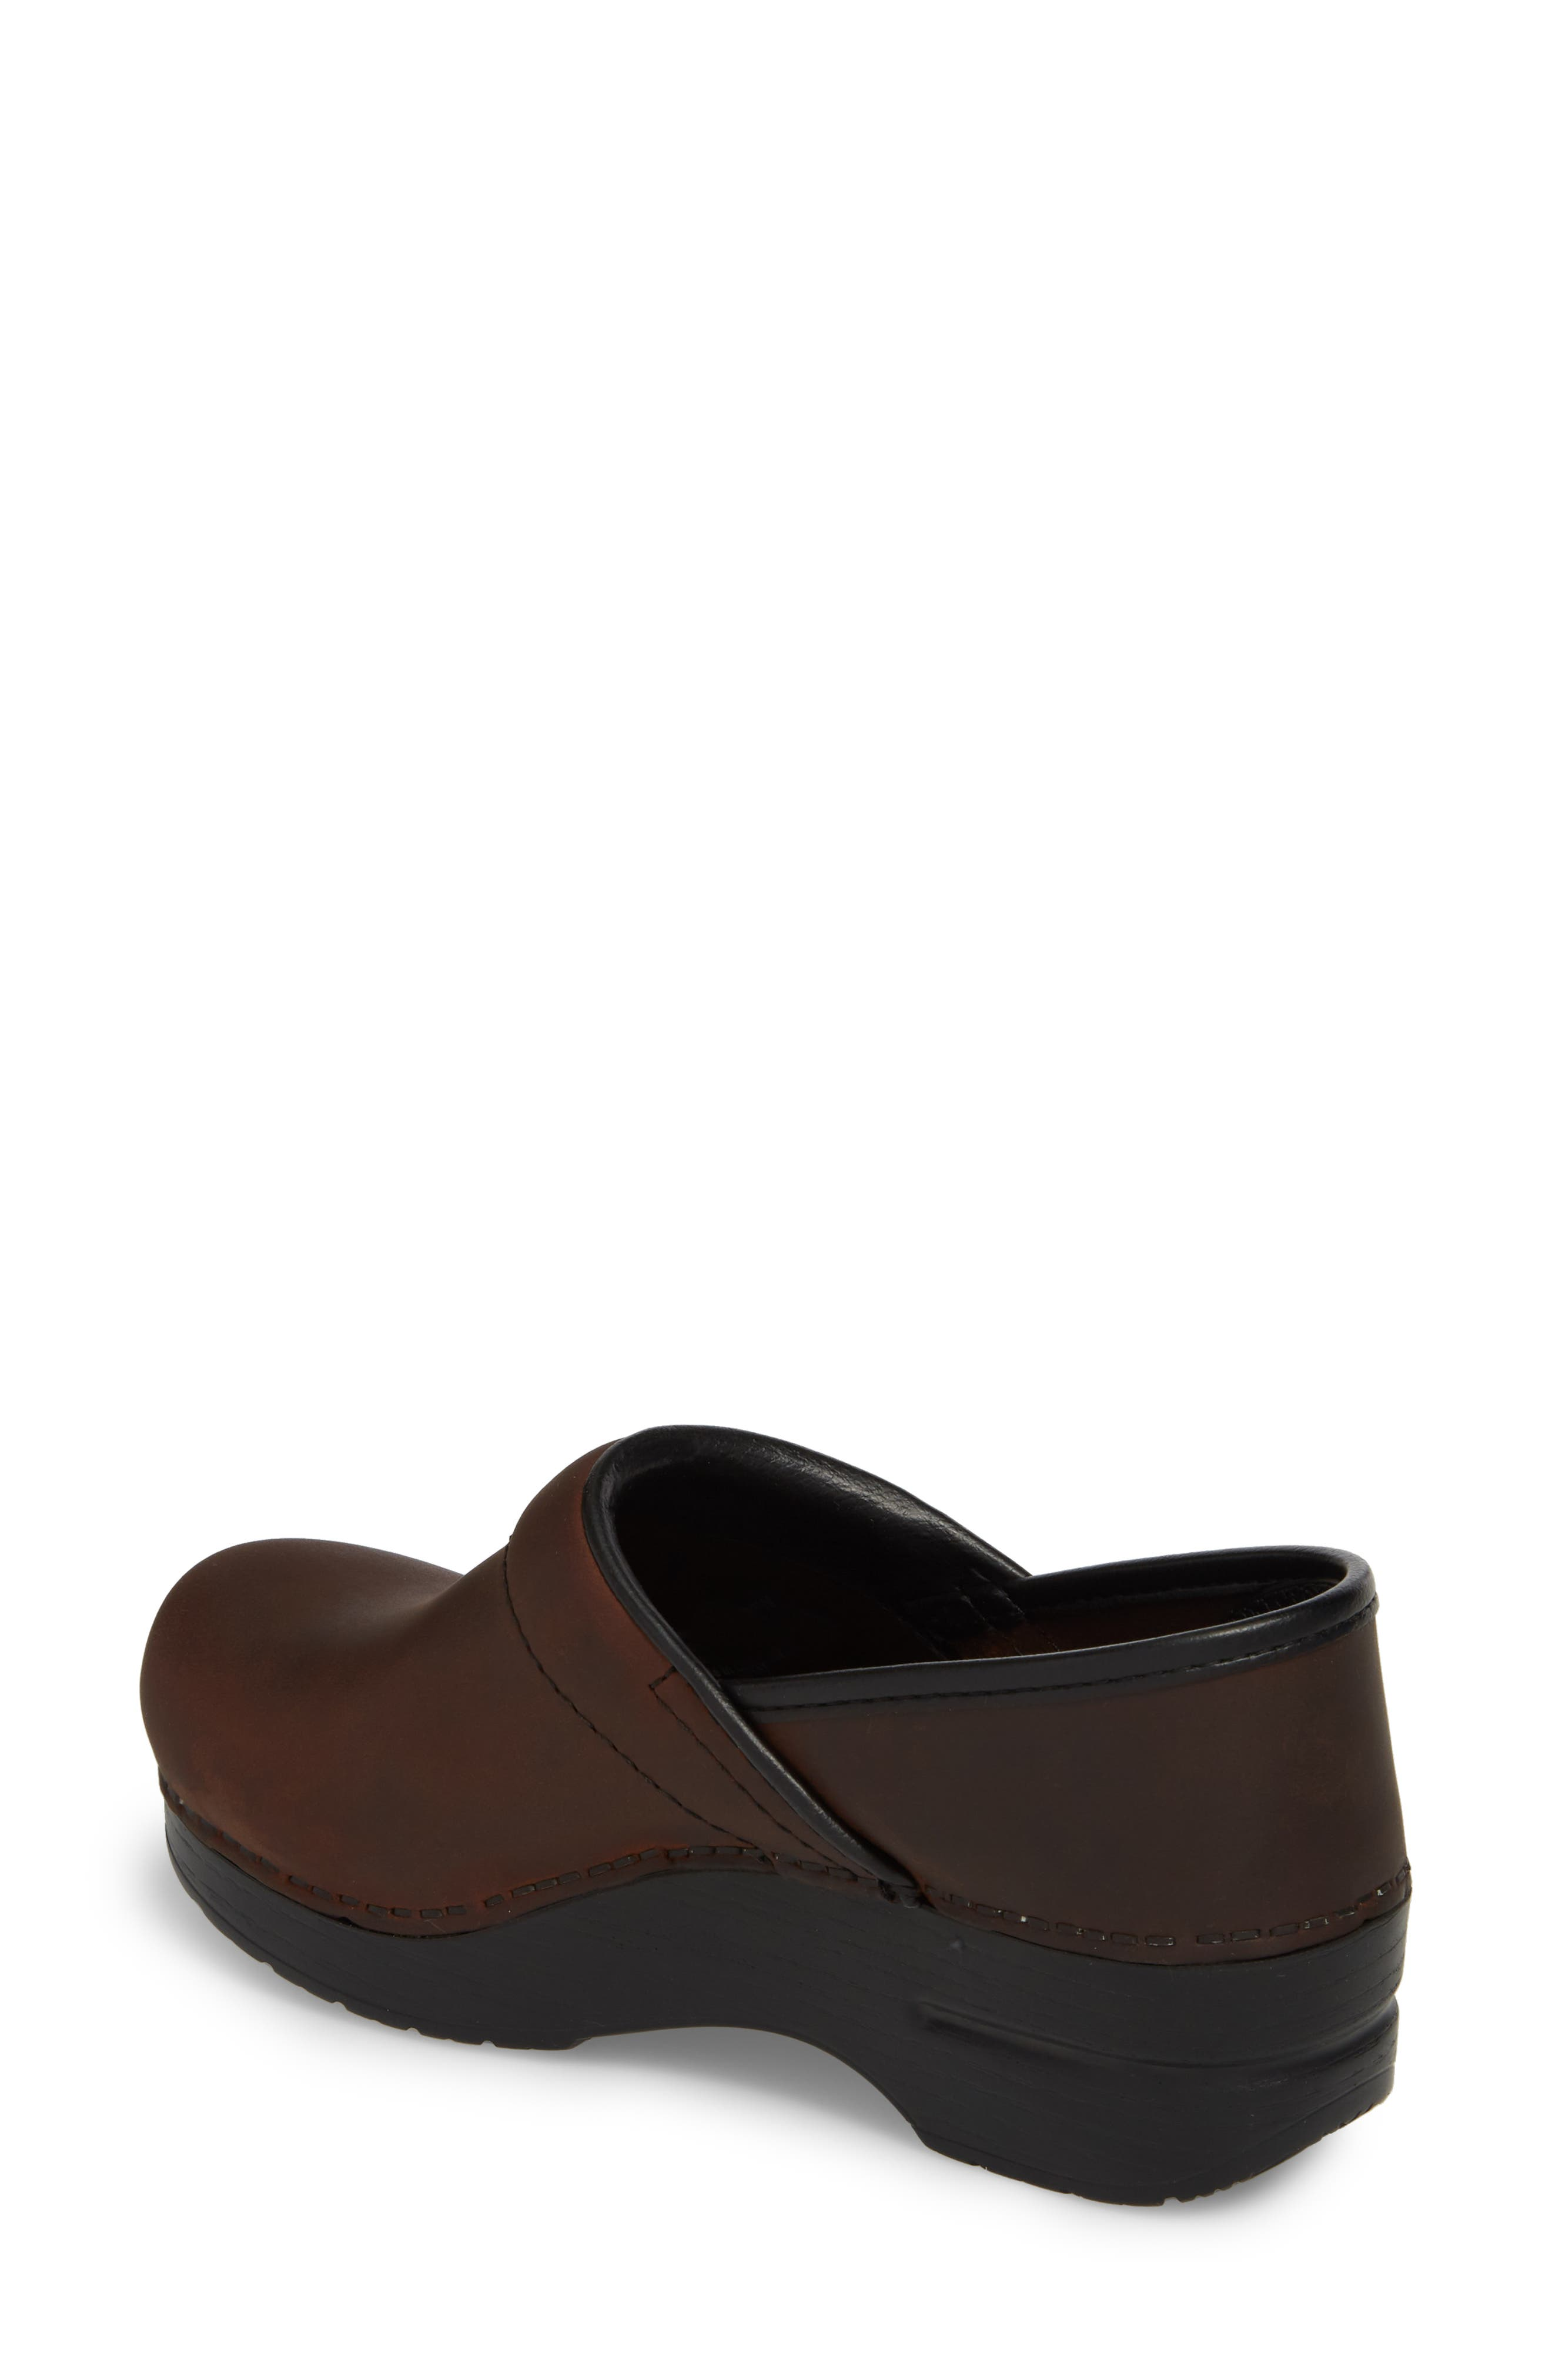 Wide Pro Clog,                             Alternate thumbnail 2, color,                             Antique Brown/ Black Leather